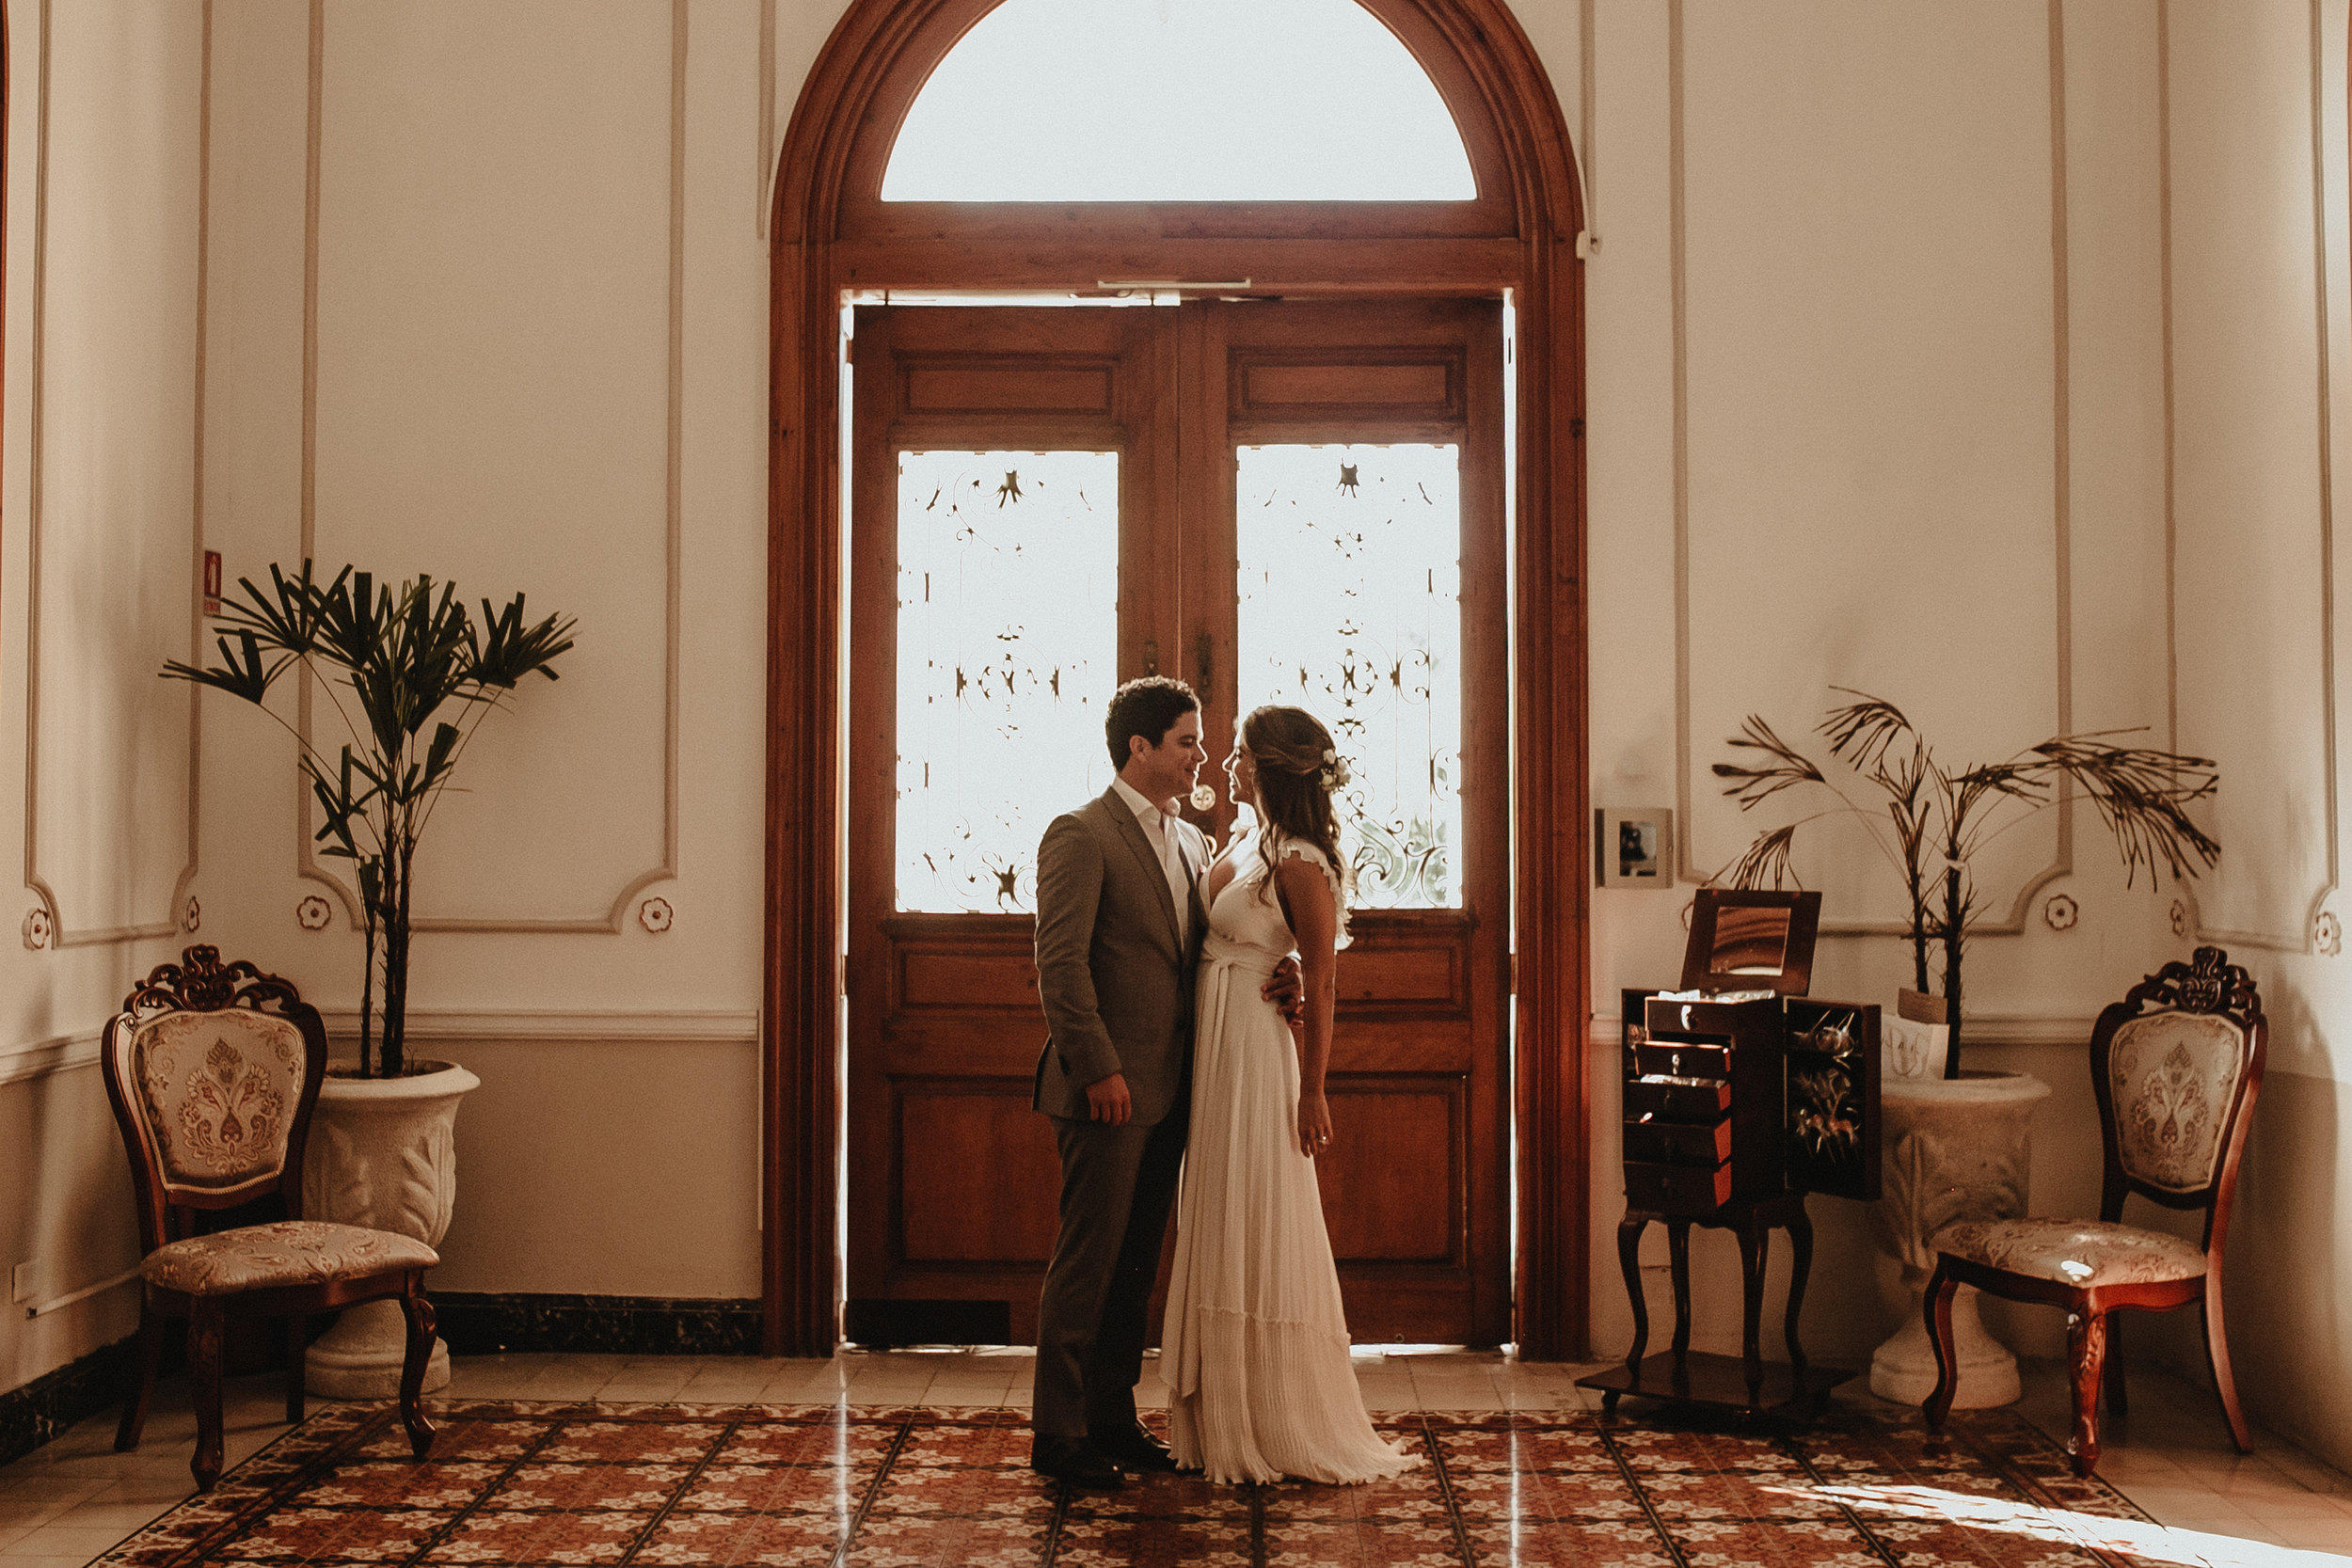 0027civil_Hacienda_WeddingDstination_MeridaYucatan_HaciendasMerida_BodasMexico_BodasYucatan_Boda_Destino.jpg